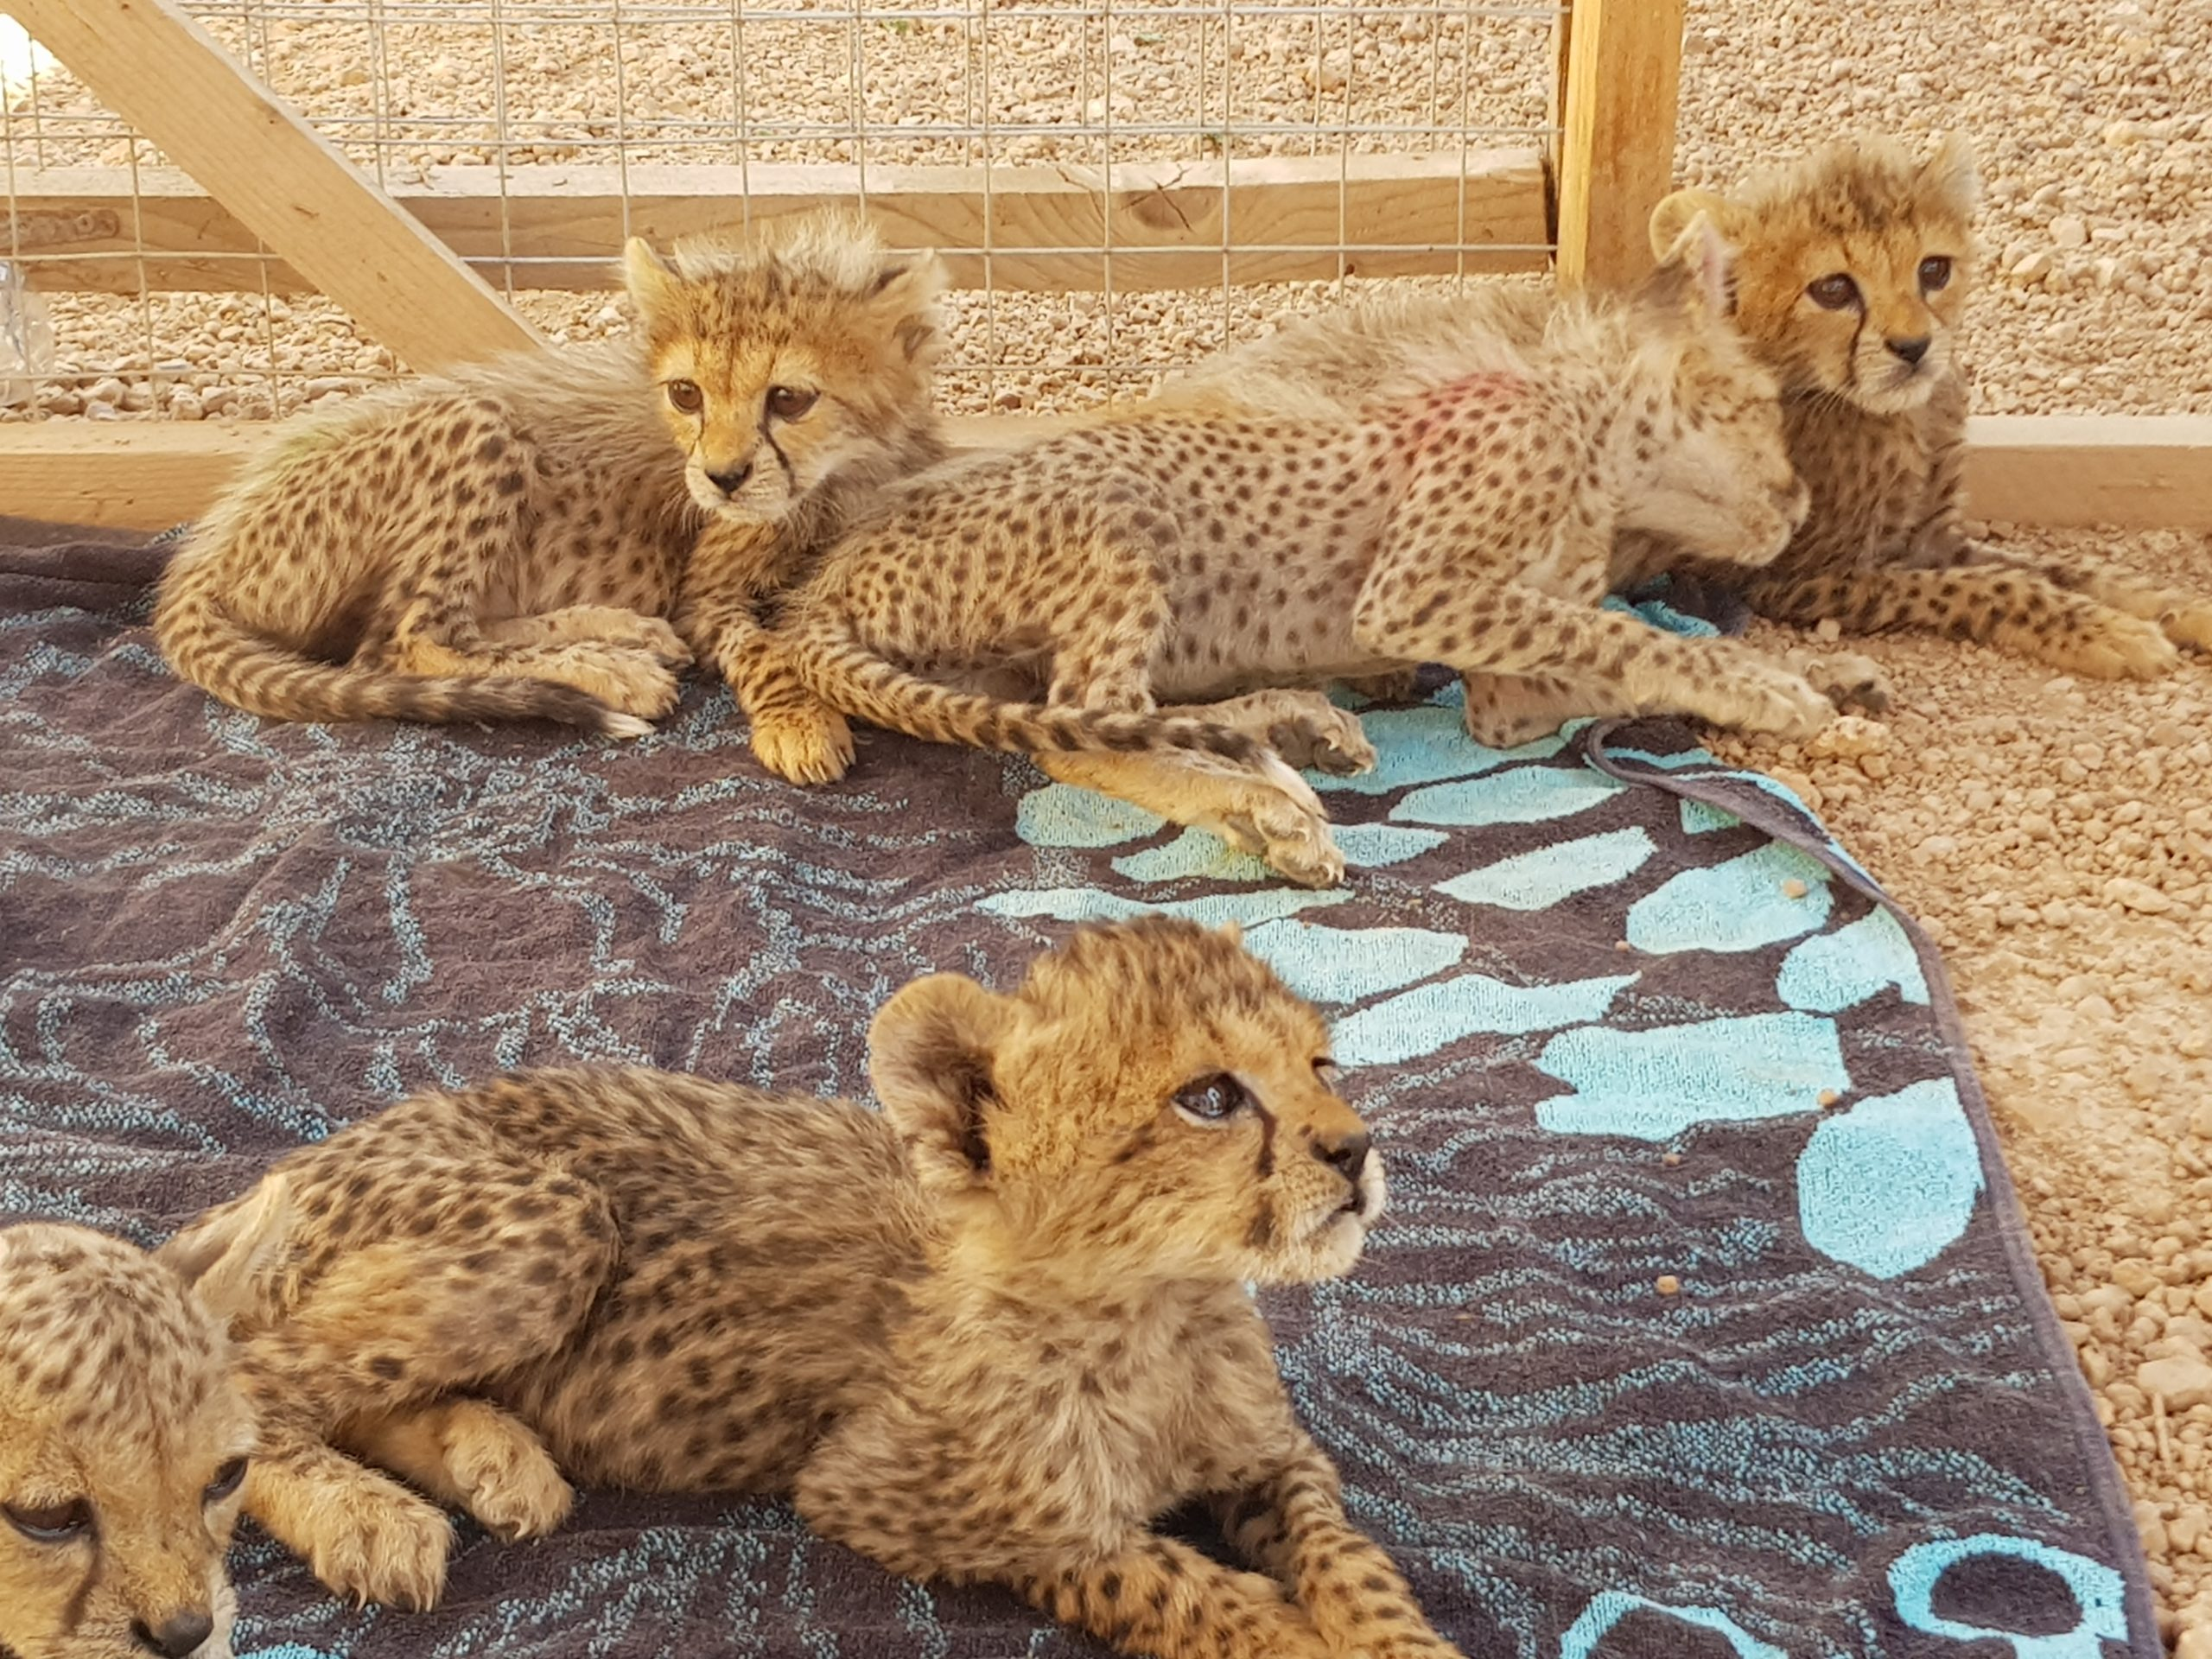 Cheetah CUBS in Cheetah Safe House in Somaliland